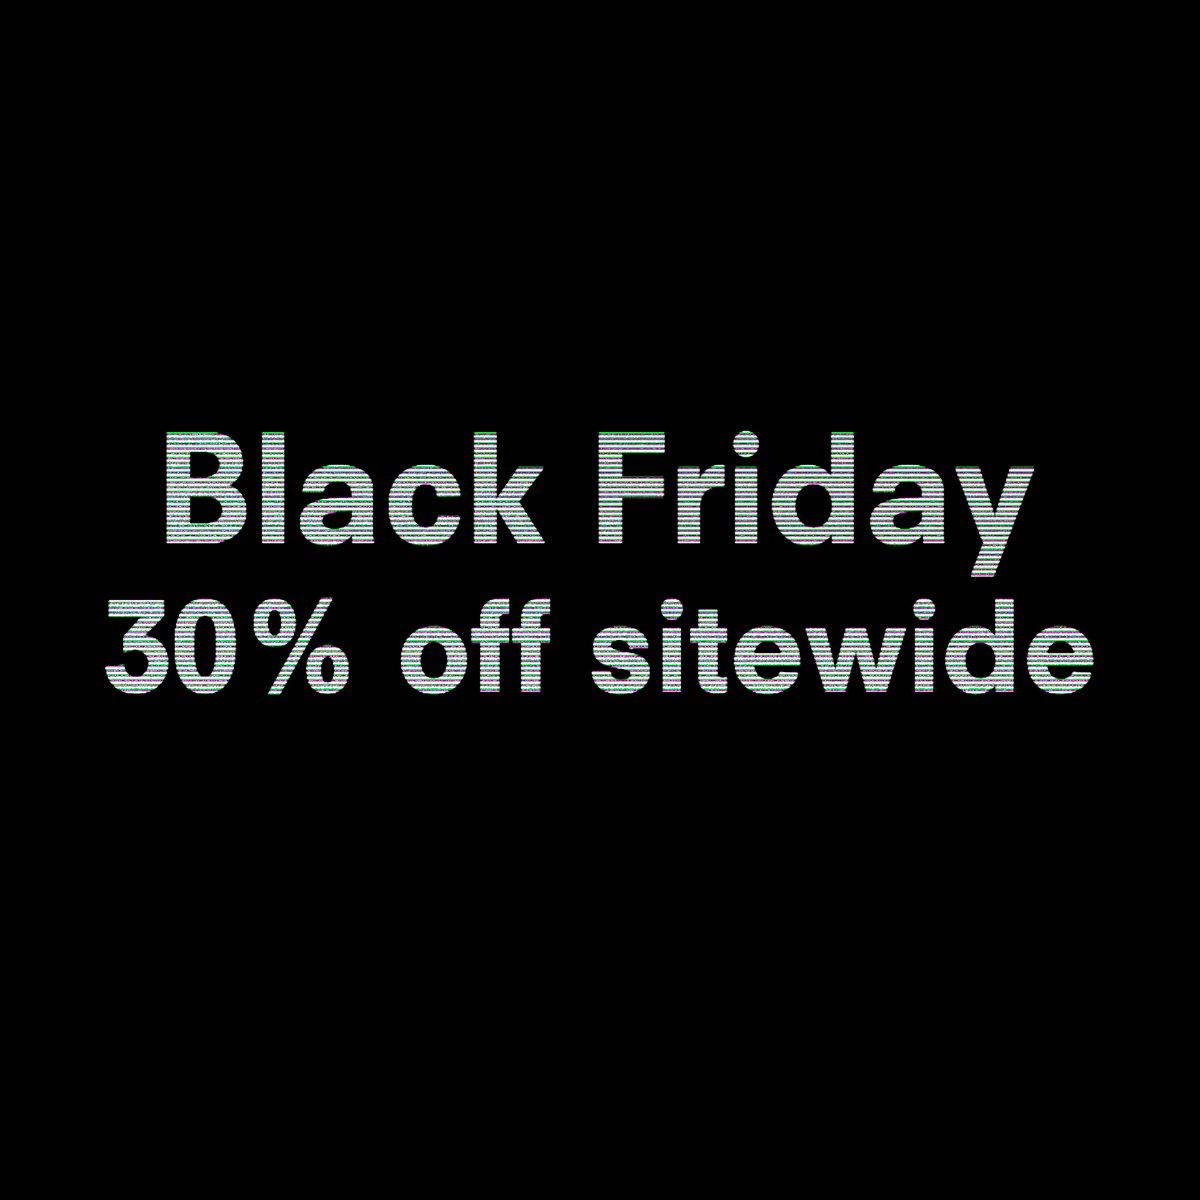 Black Friday! Enjoy 30% off sitewide and many more sales now on @rad #radshop #blackfriday https://t.co/4U8AqJb3IX https://t.co/wbuWH1gXB7